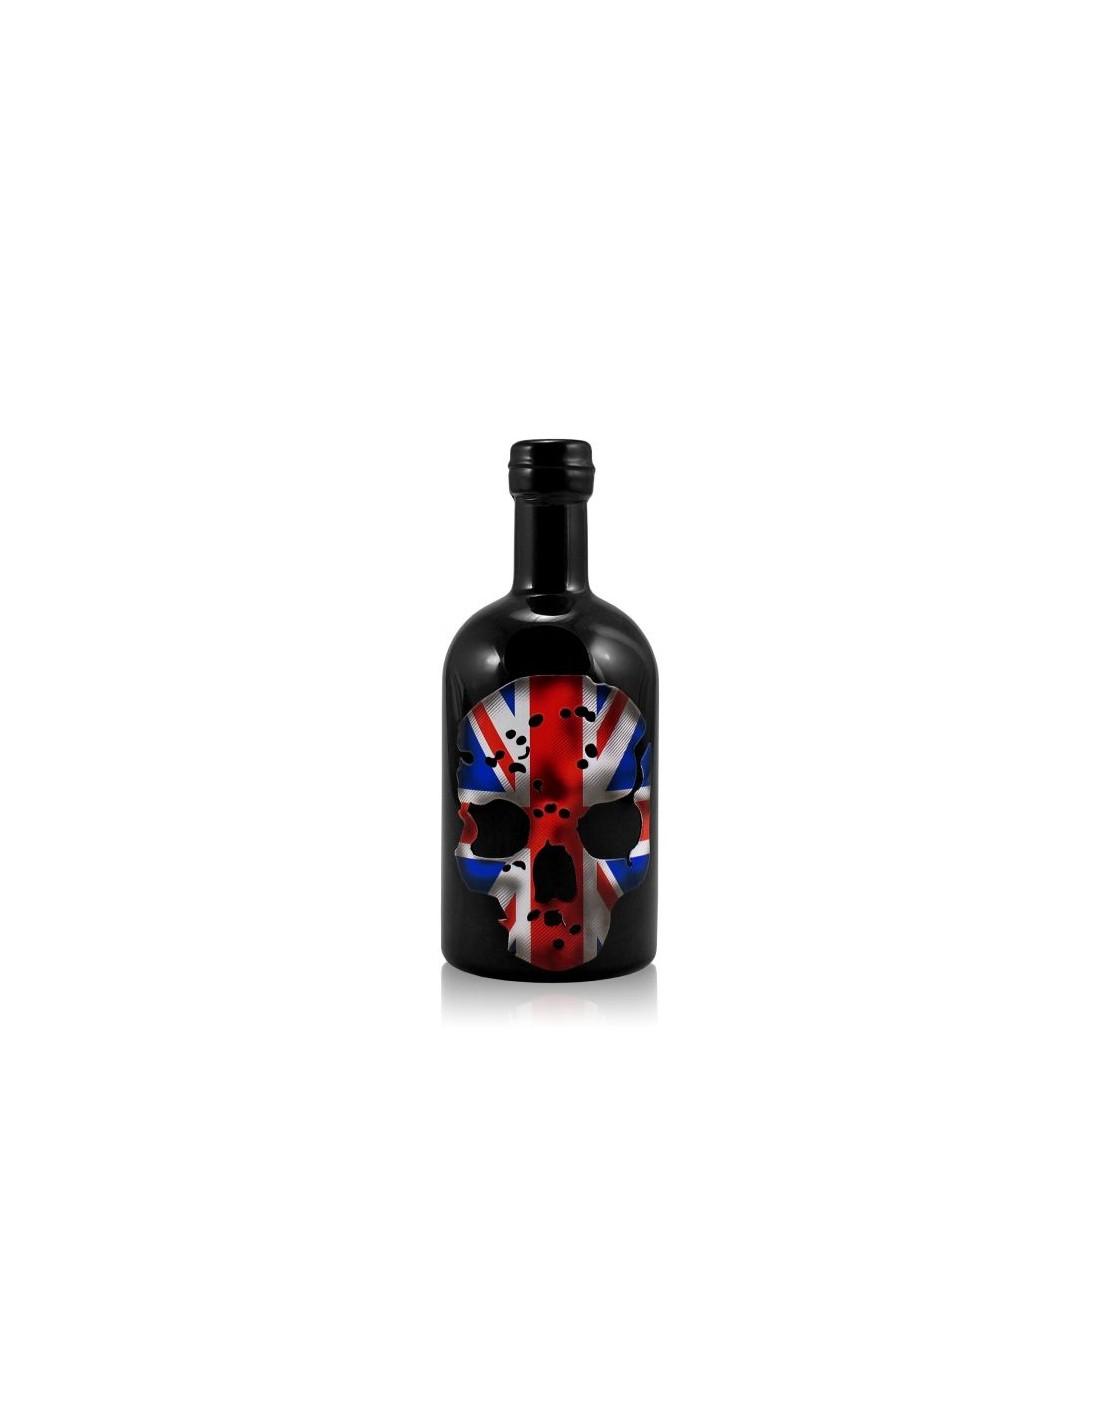 Vodca Ghost The Union Jack Skull 40% alc., 0.7L, Marea Britanie